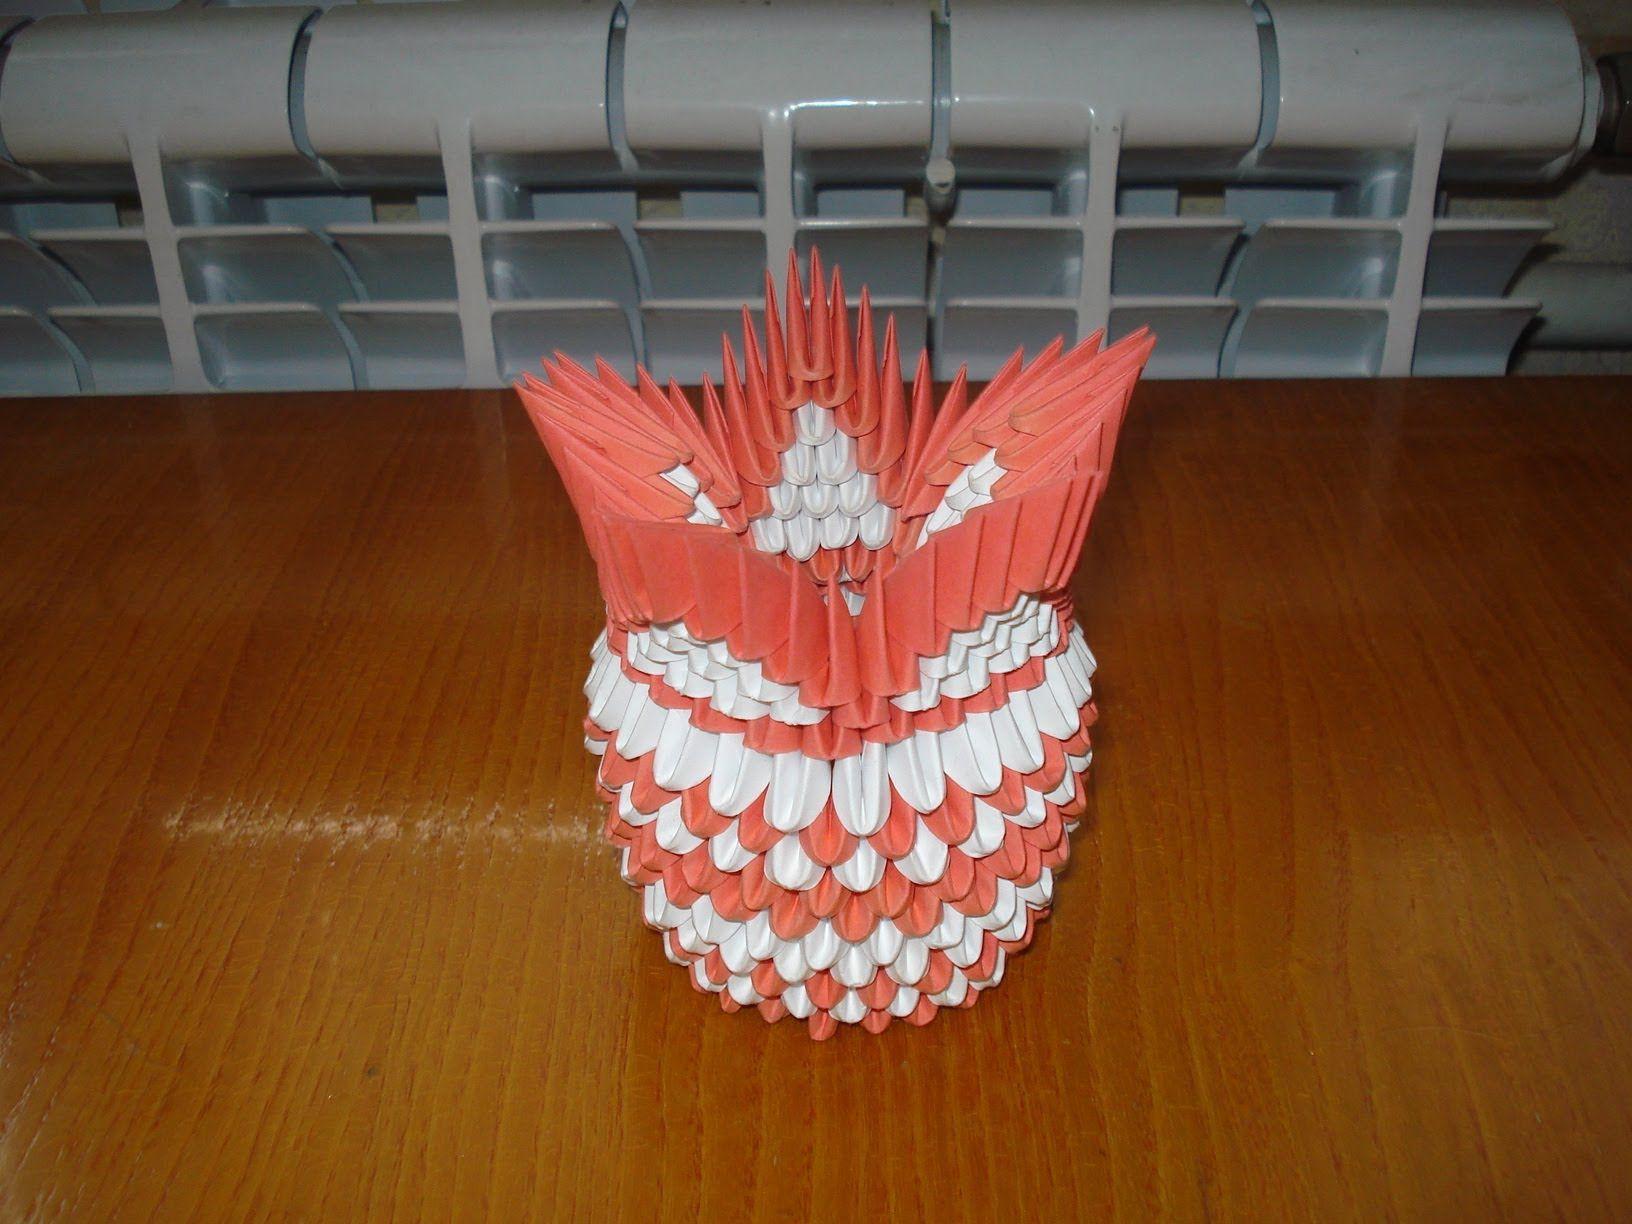 3d Origami Vase Tutorial 4 Pinterest Origami3d Swantutorial Blue39s Chinese Modular Swan Diagram